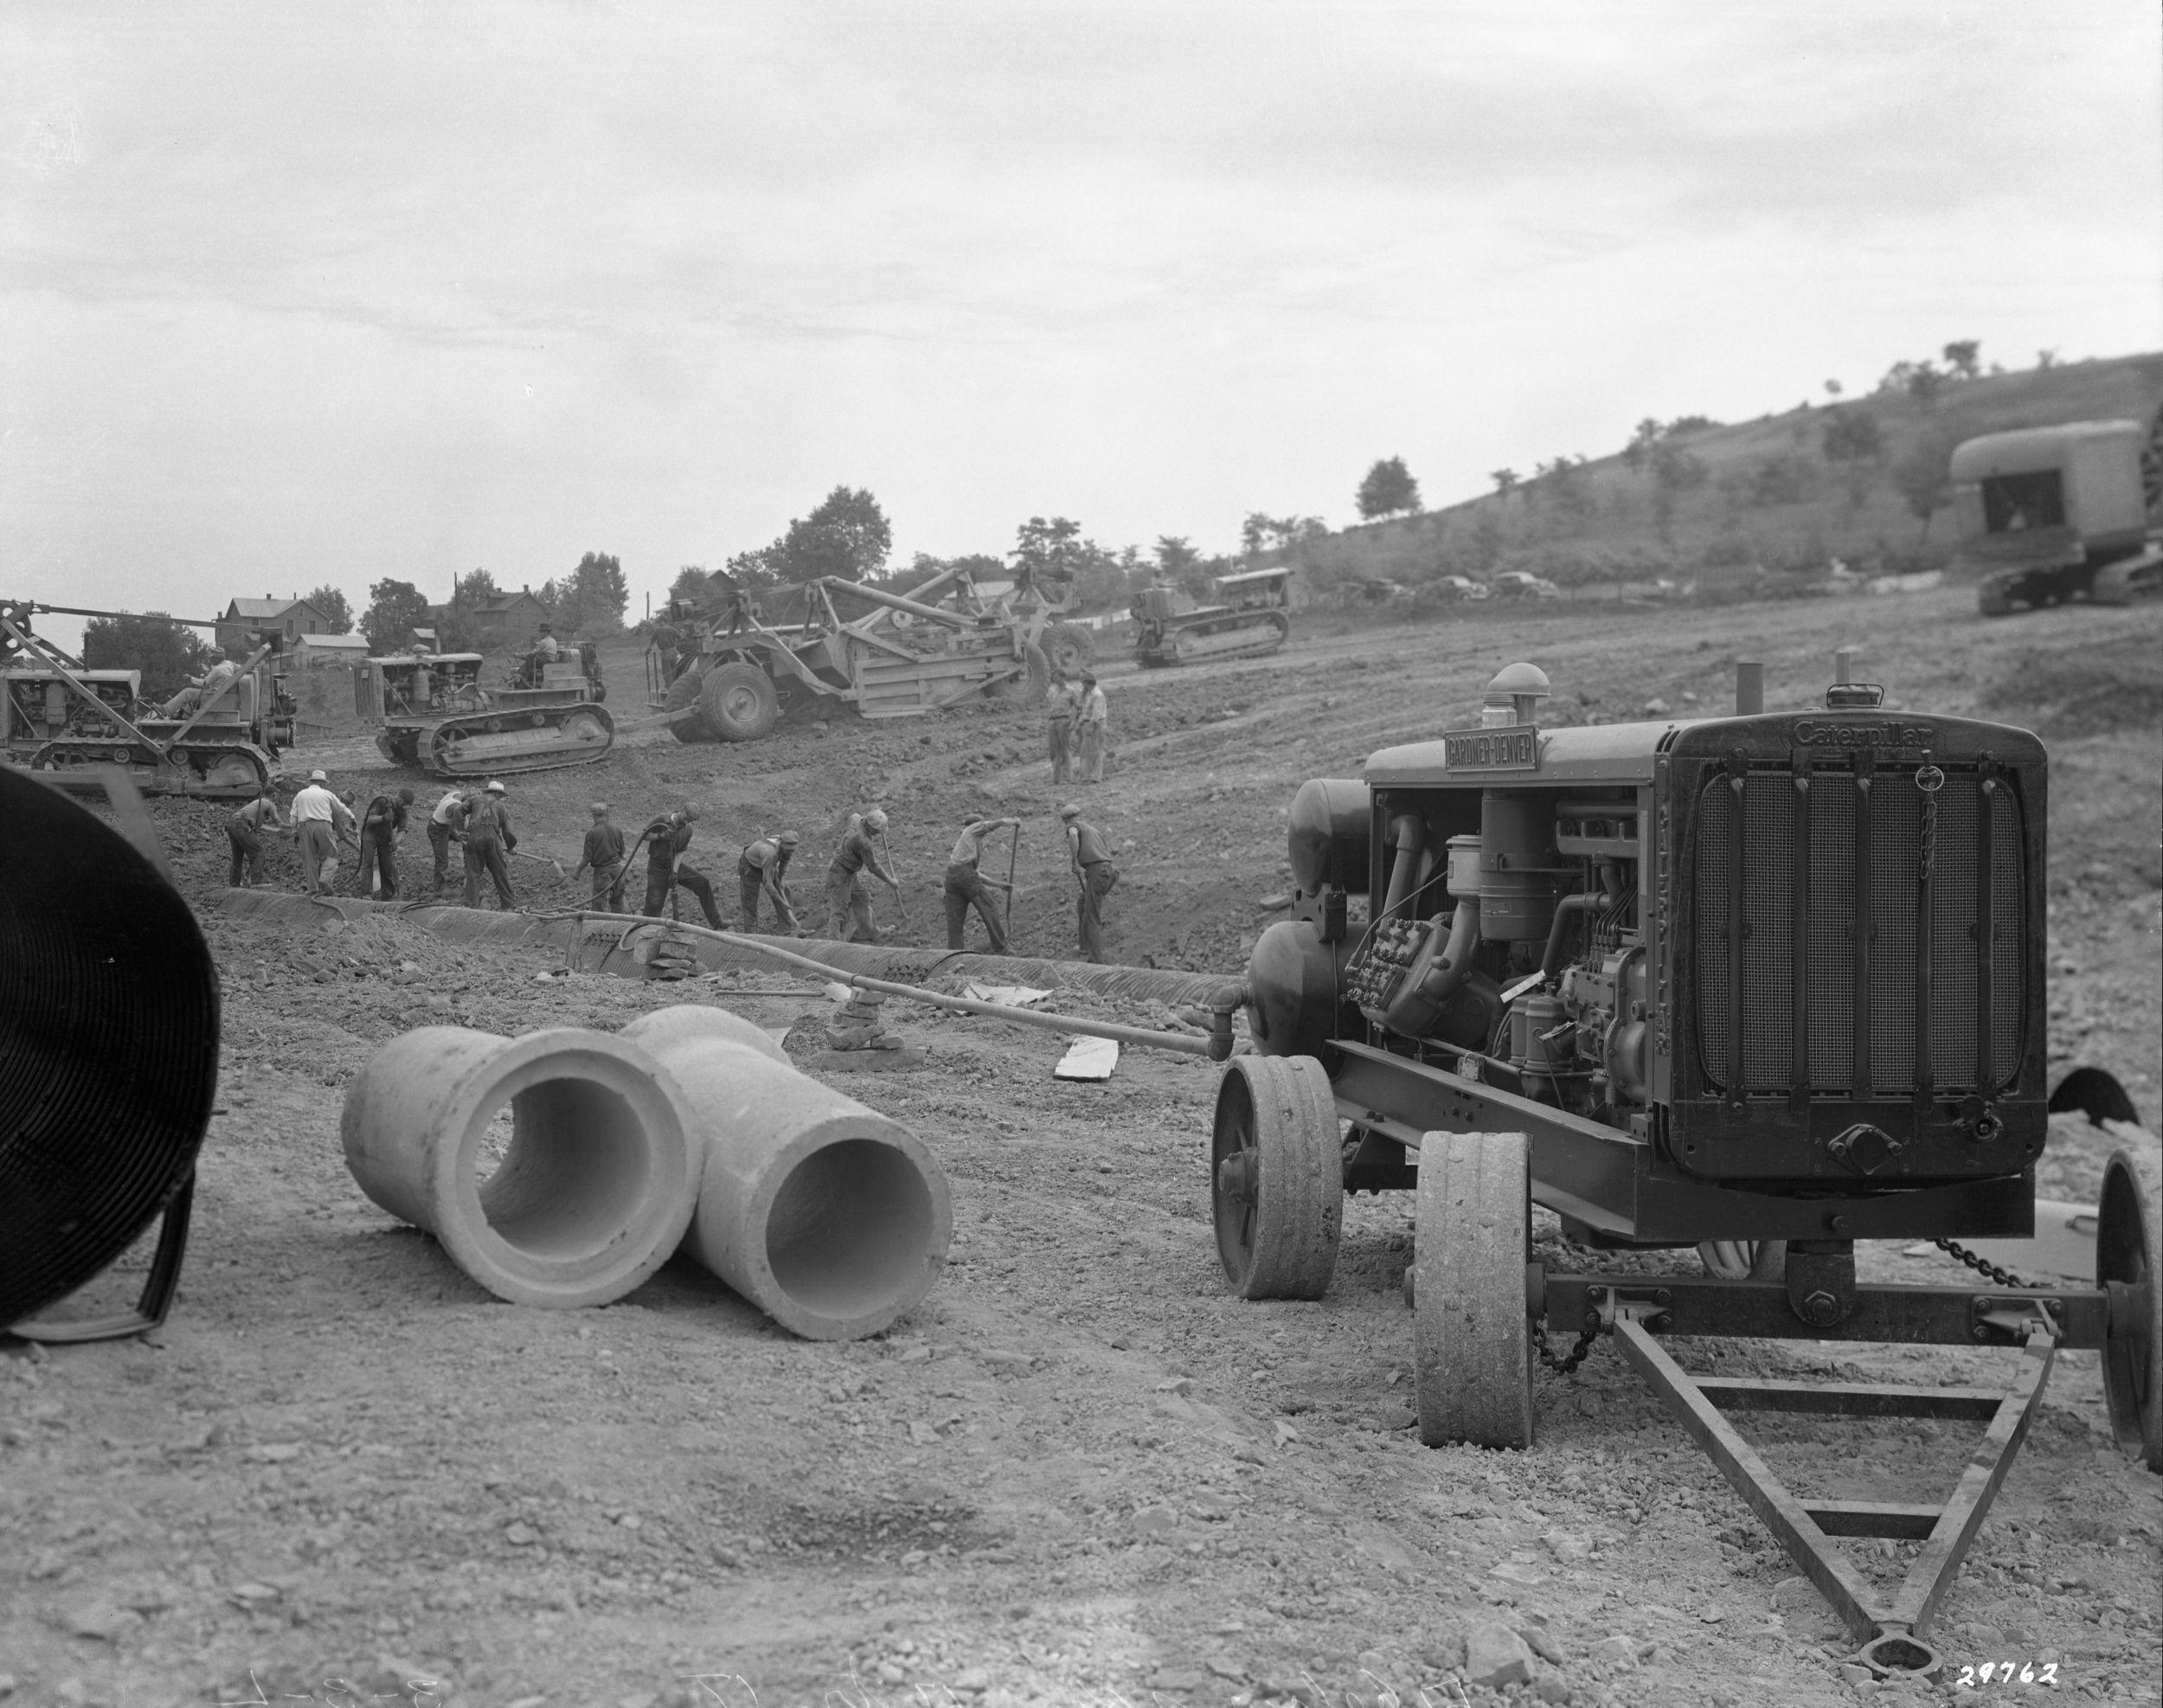 Cat® equipment constructs Pennsylvania Turnpike, 1938